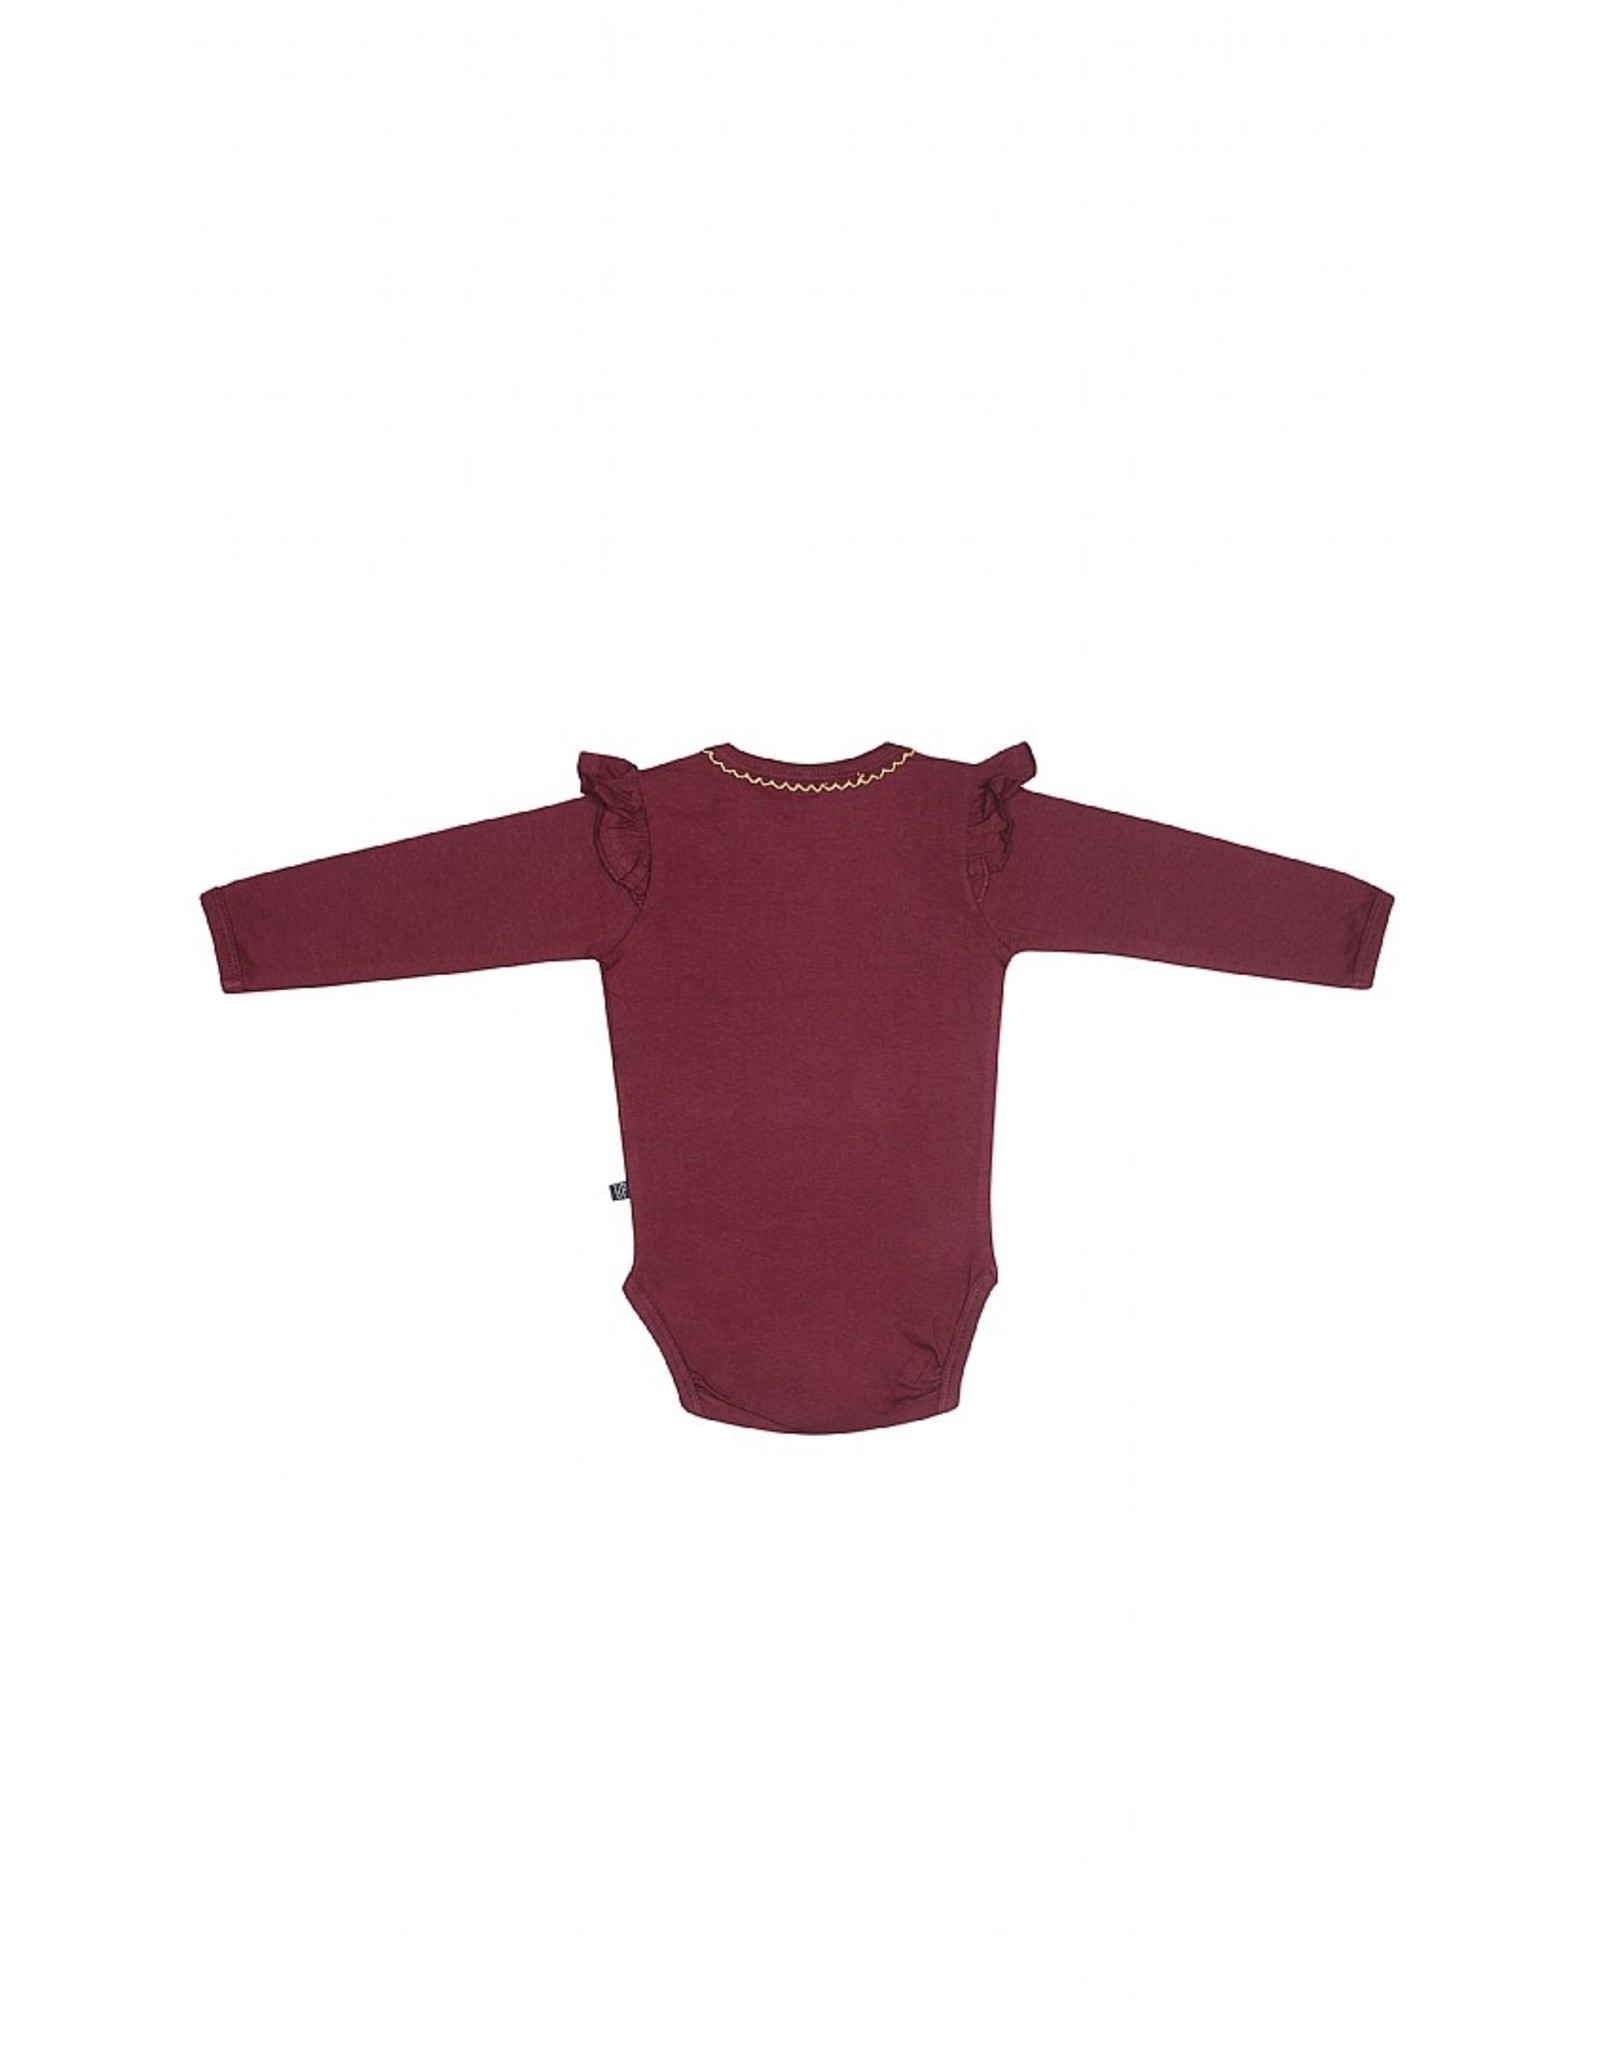 KIDS UP Kids Up Baby Body Burgundy